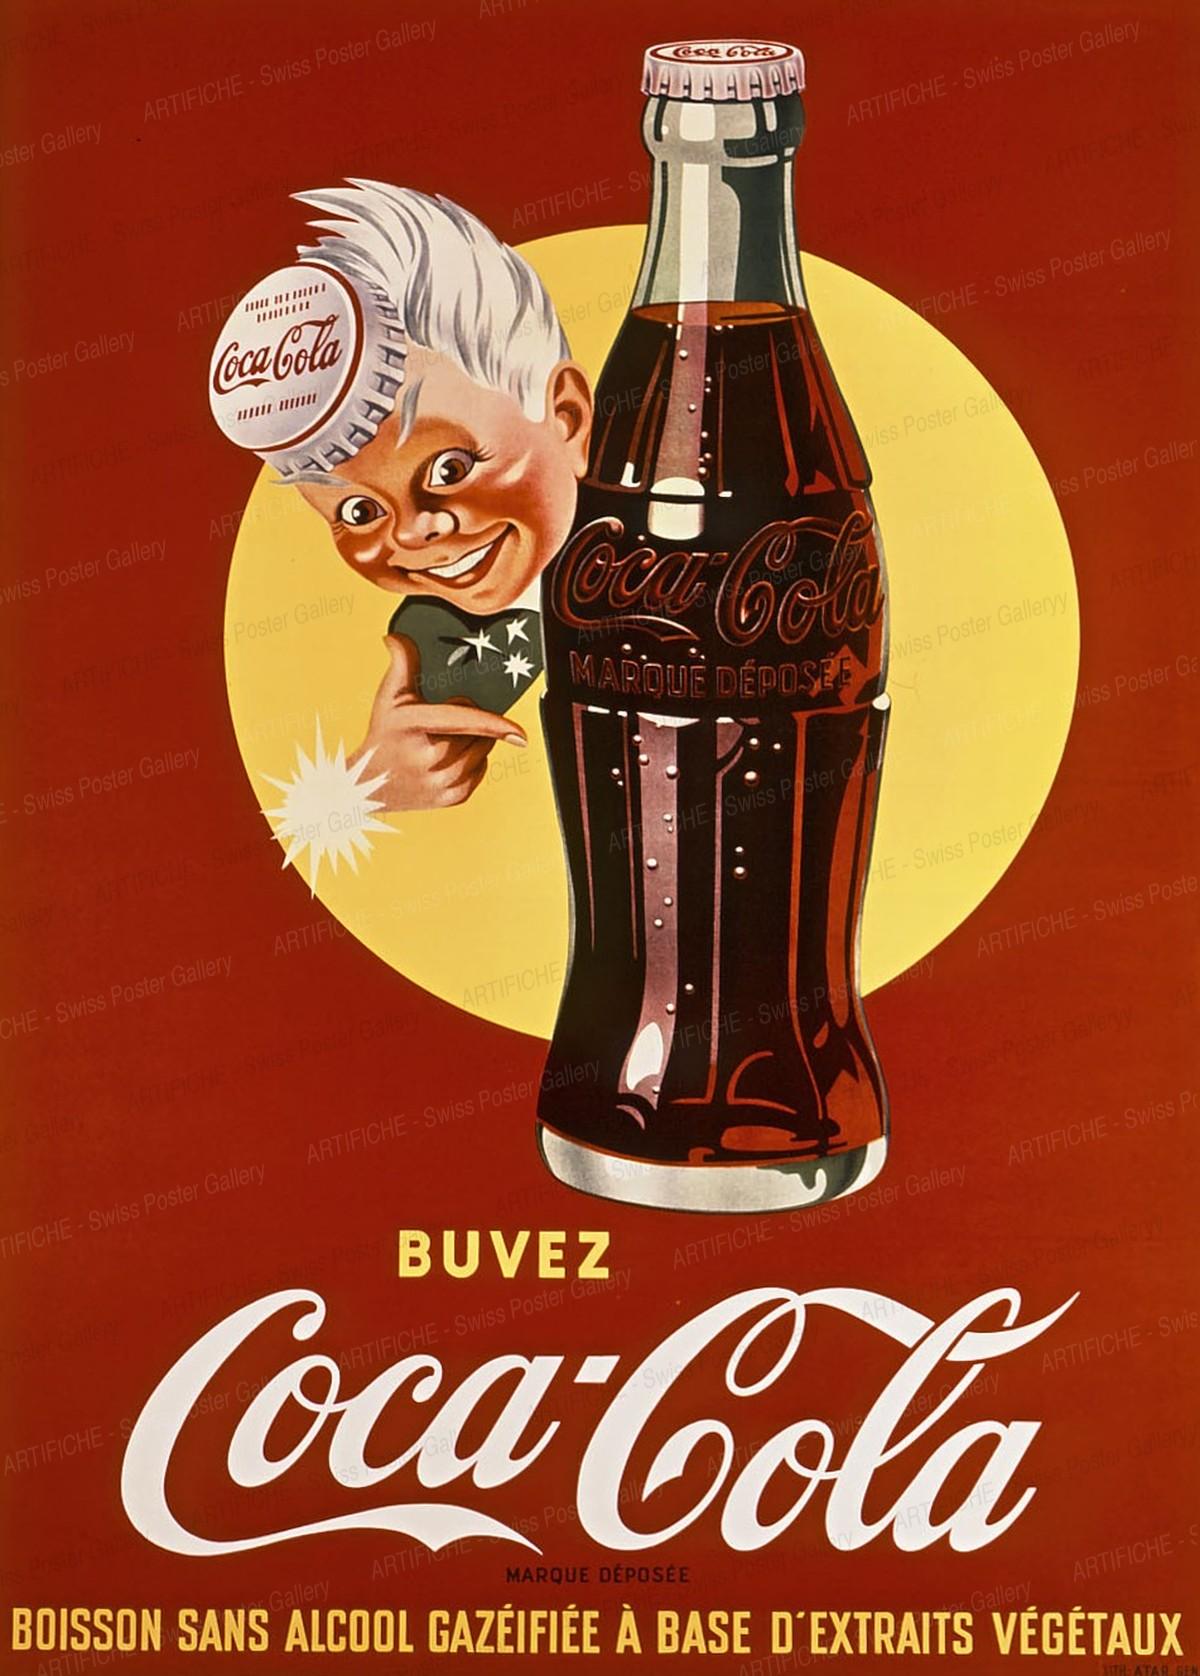 Buvez Coca Cola, Marcus Campbell